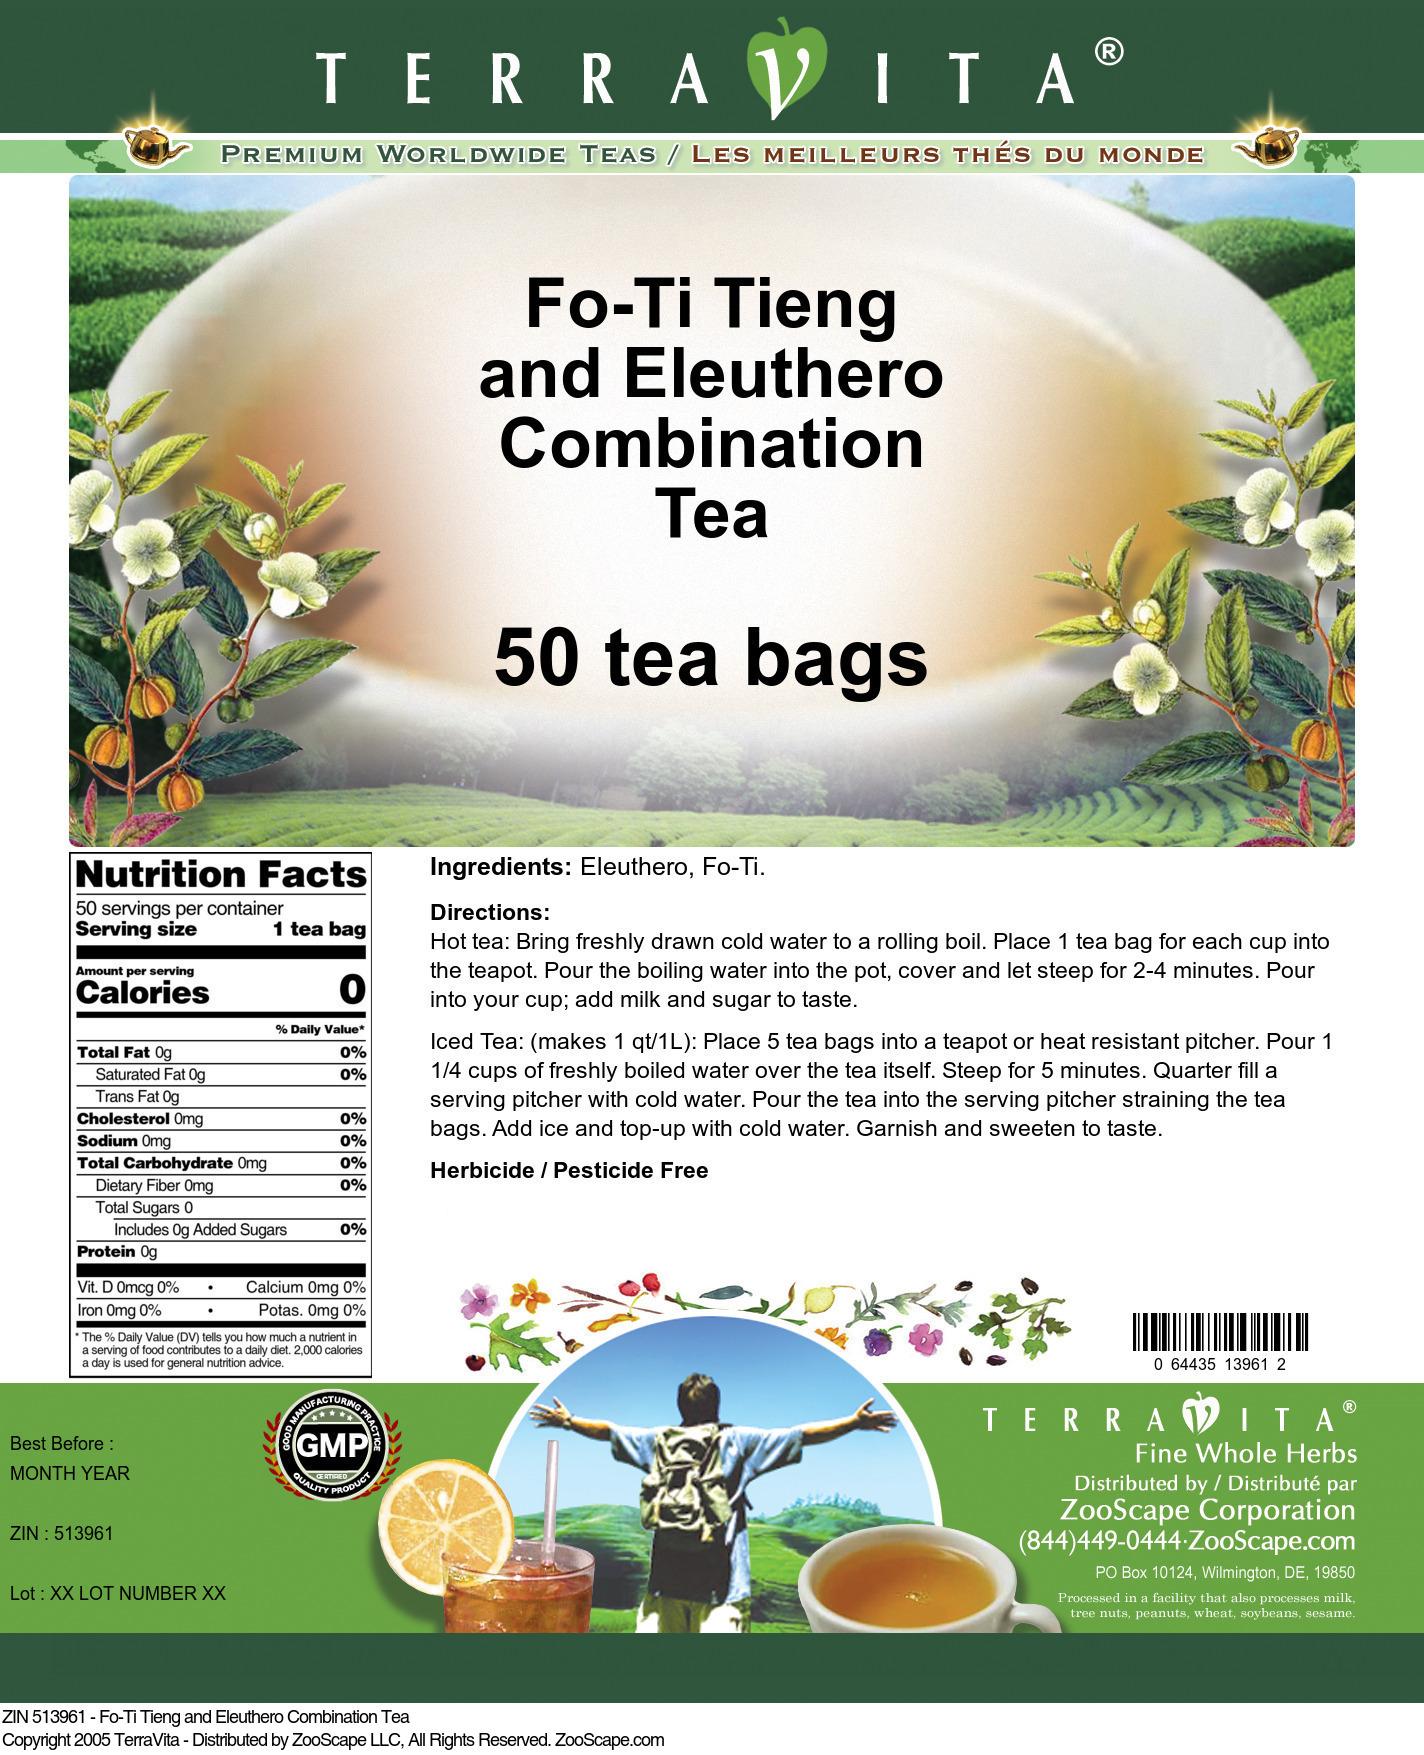 Fo-Ti Tieng and Eleuthero Combination Tea